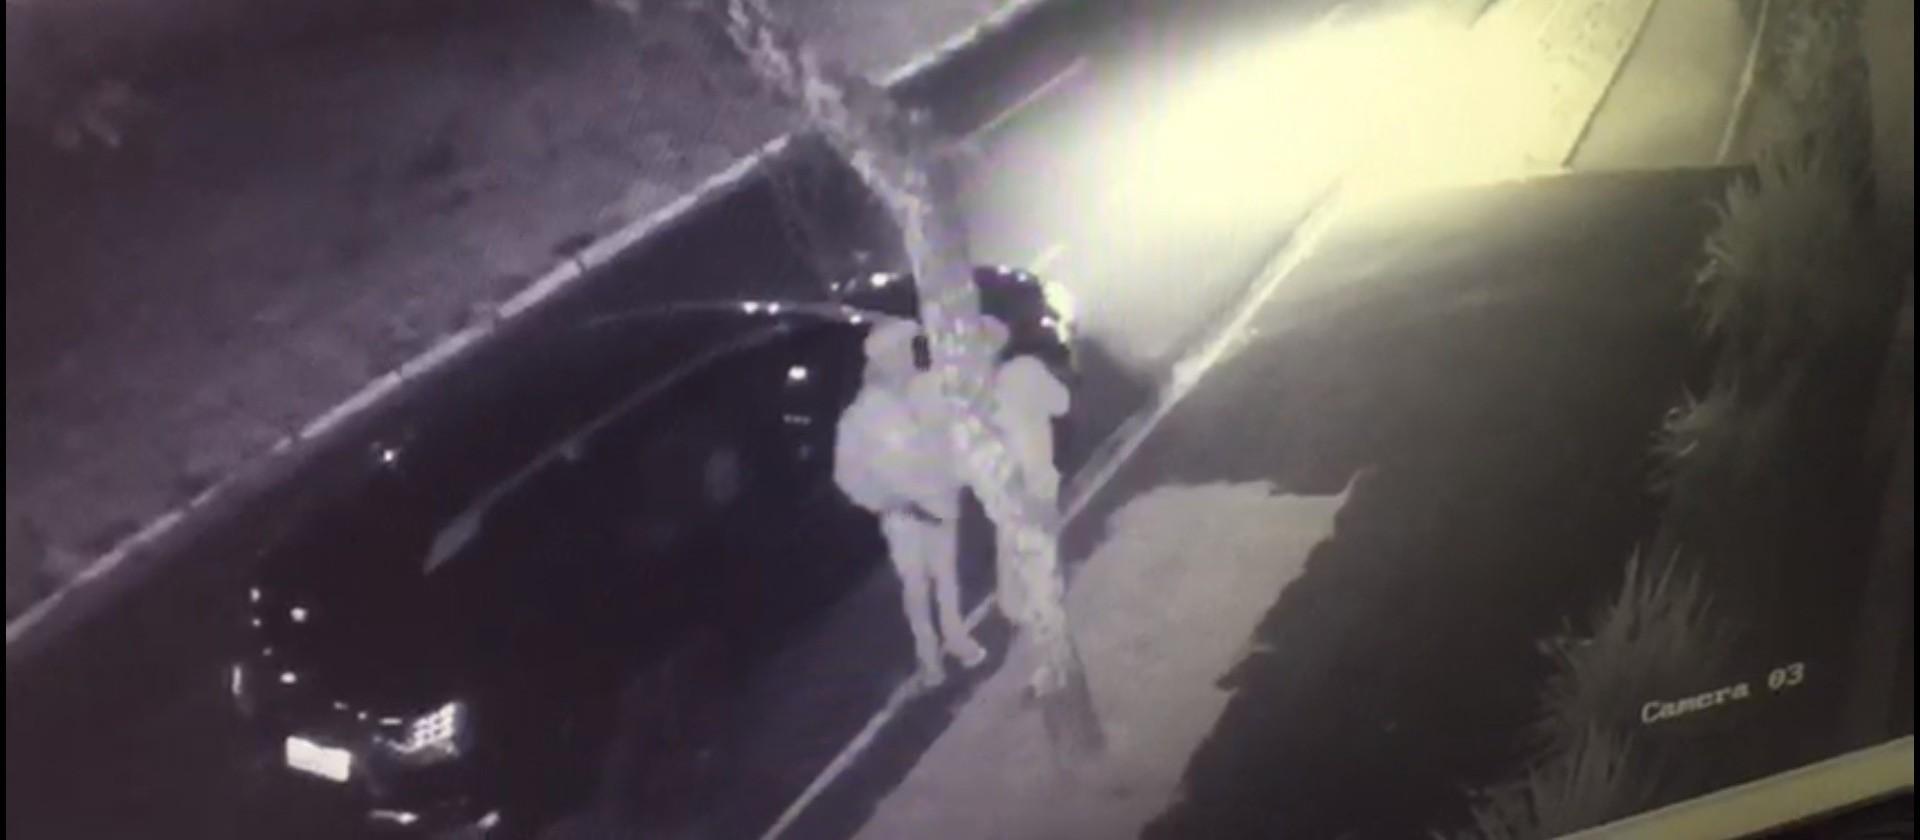 Polícia prende suspeitos de roubar caminhonete e agredir motorista